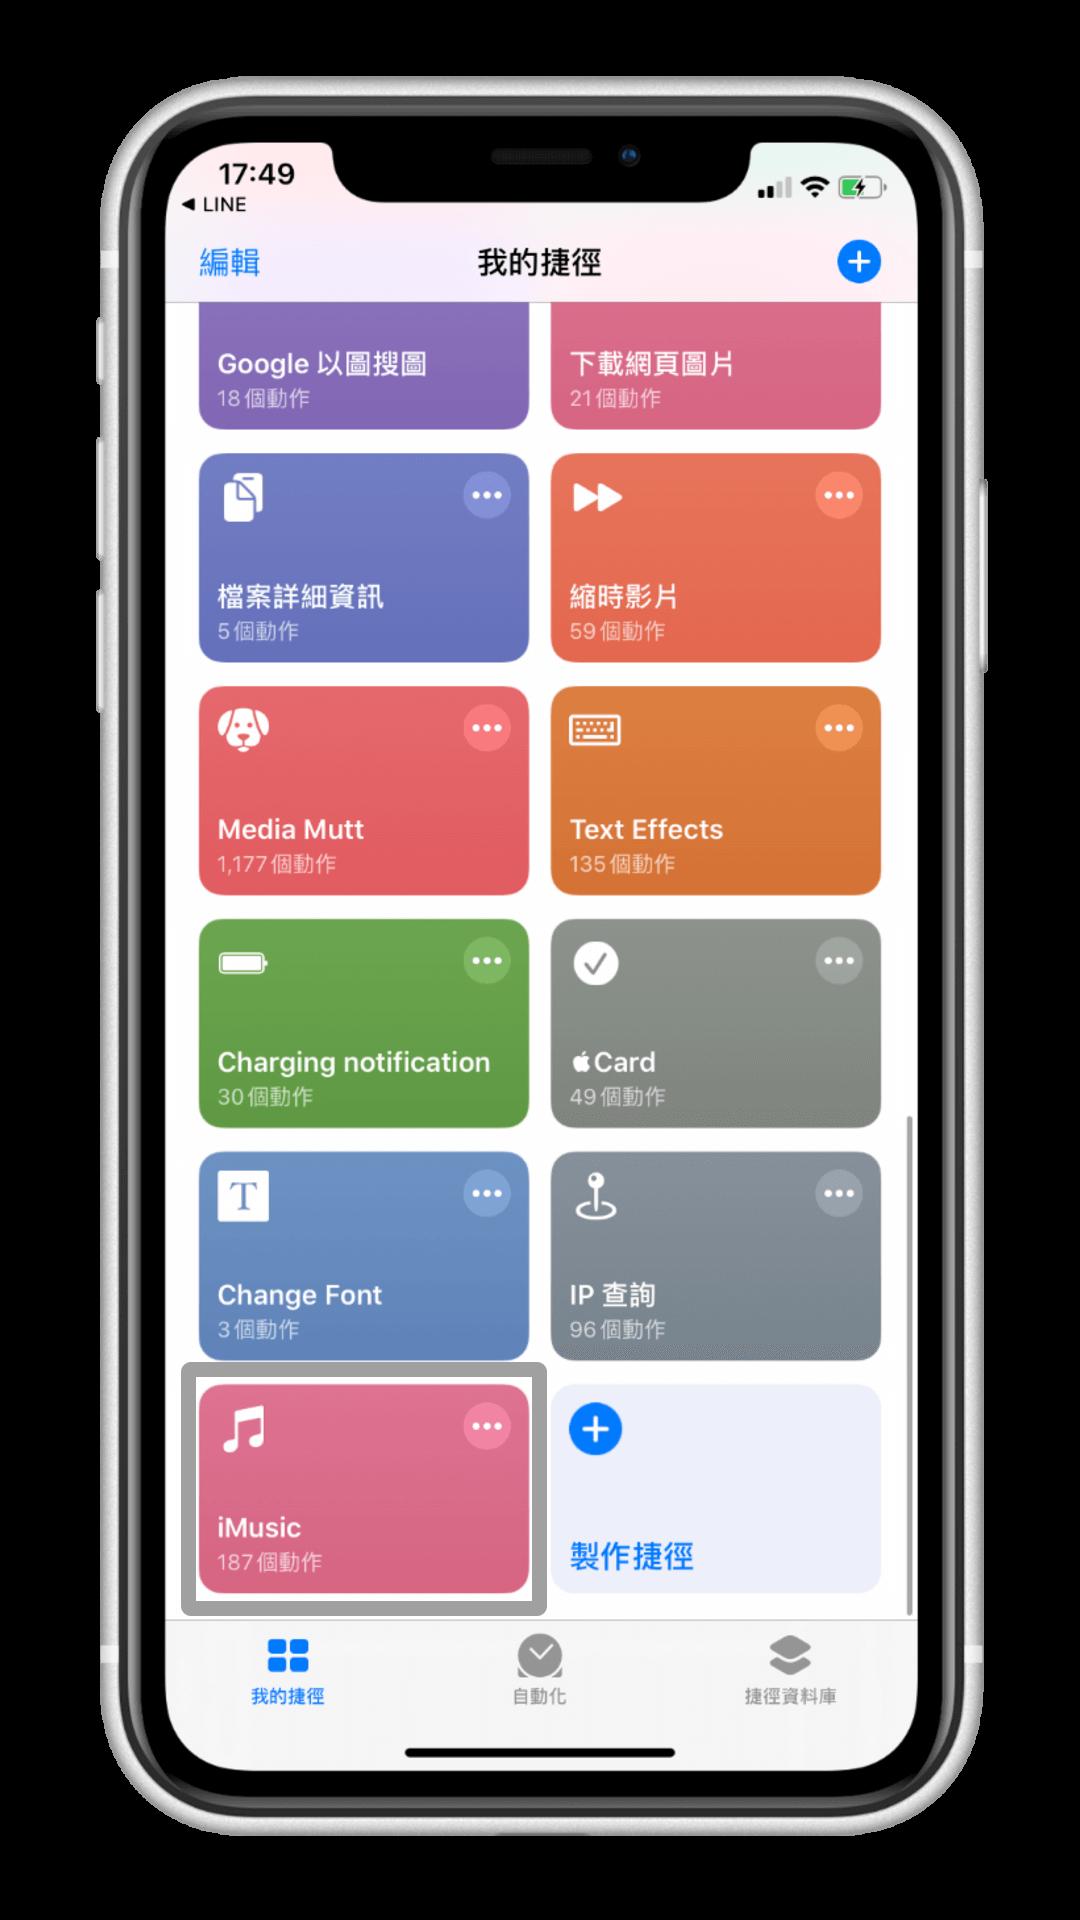 iphone 下載 YouTube 音樂 - iOS 捷徑